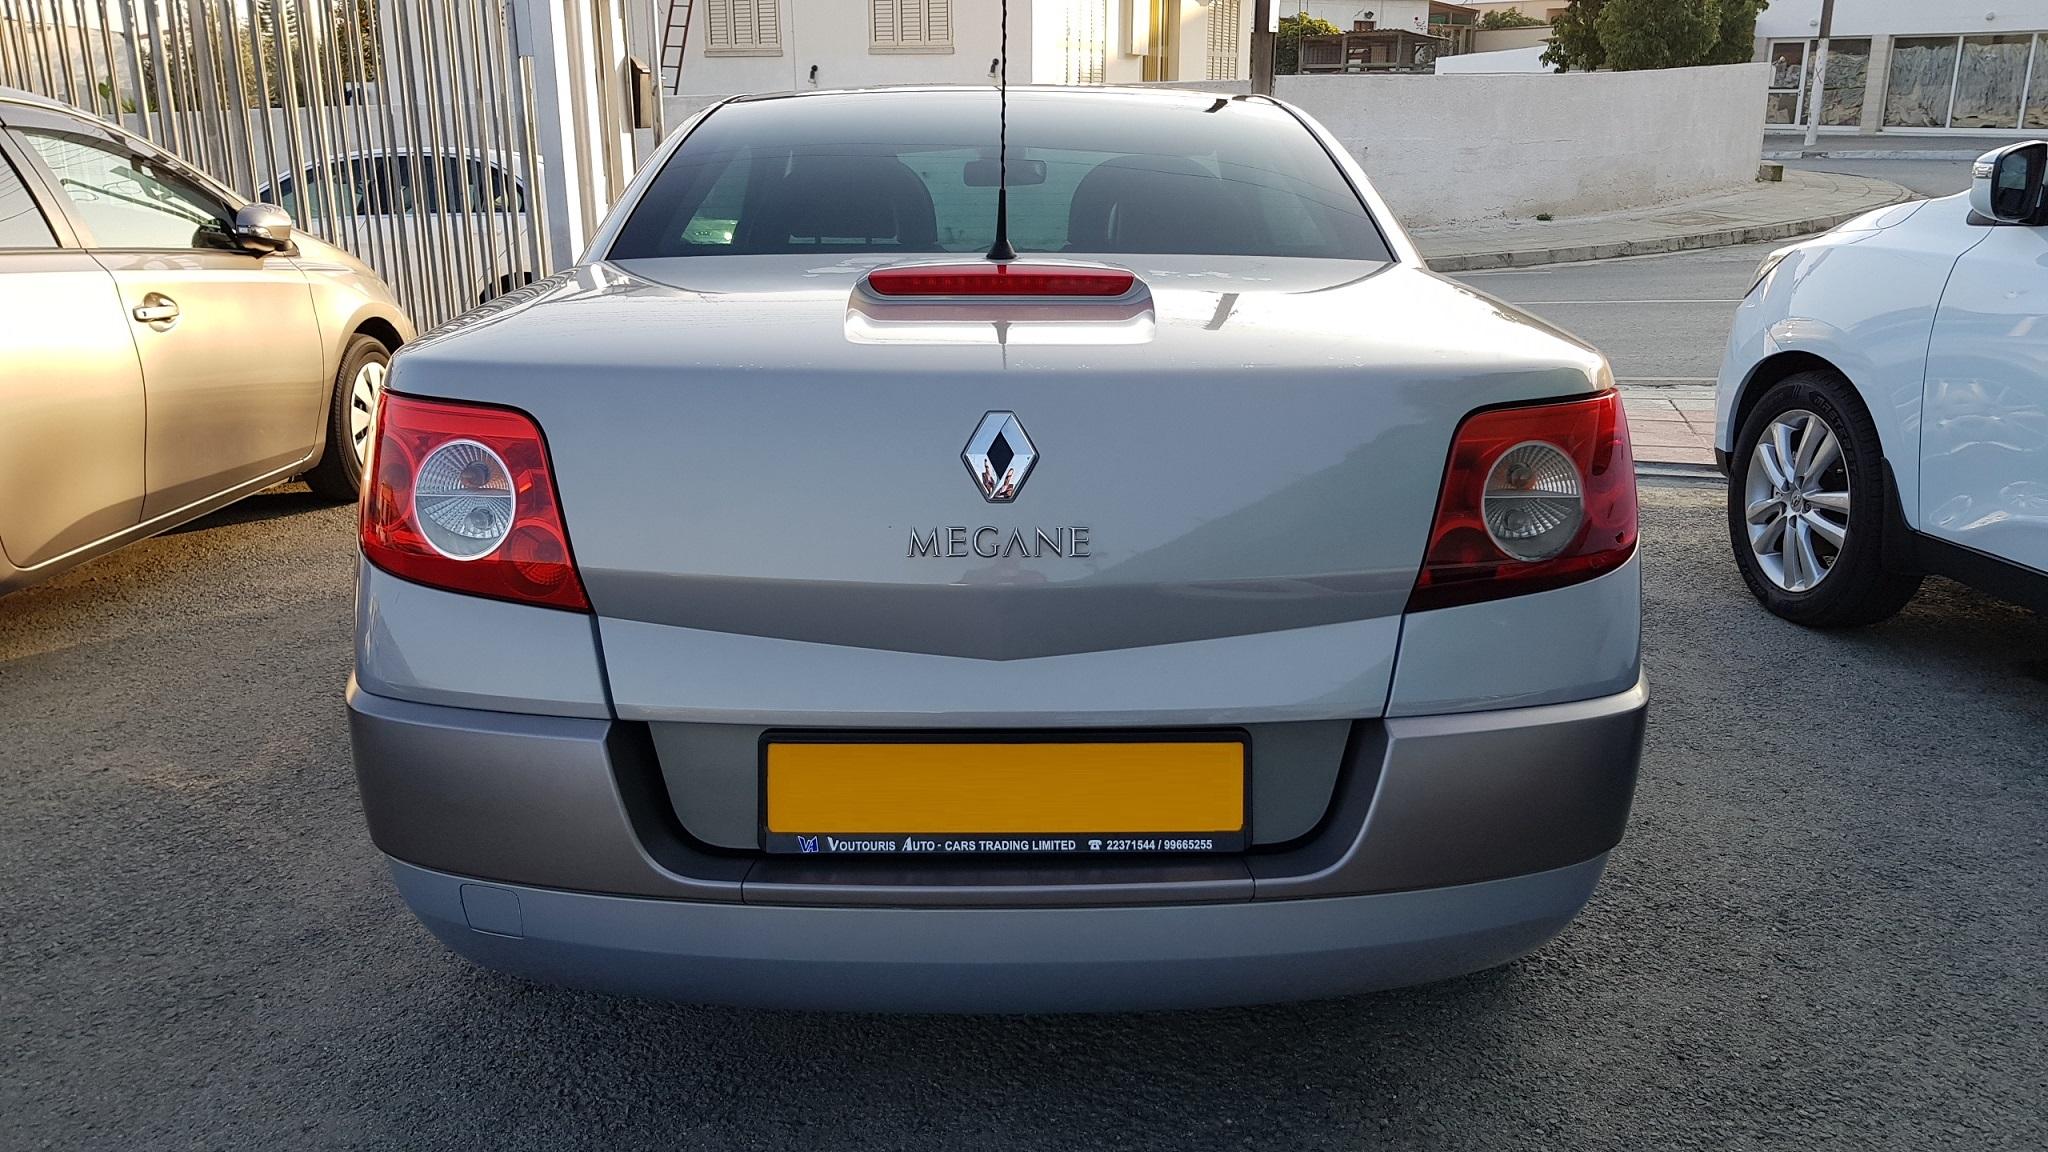 Renault Megane Convertible 04